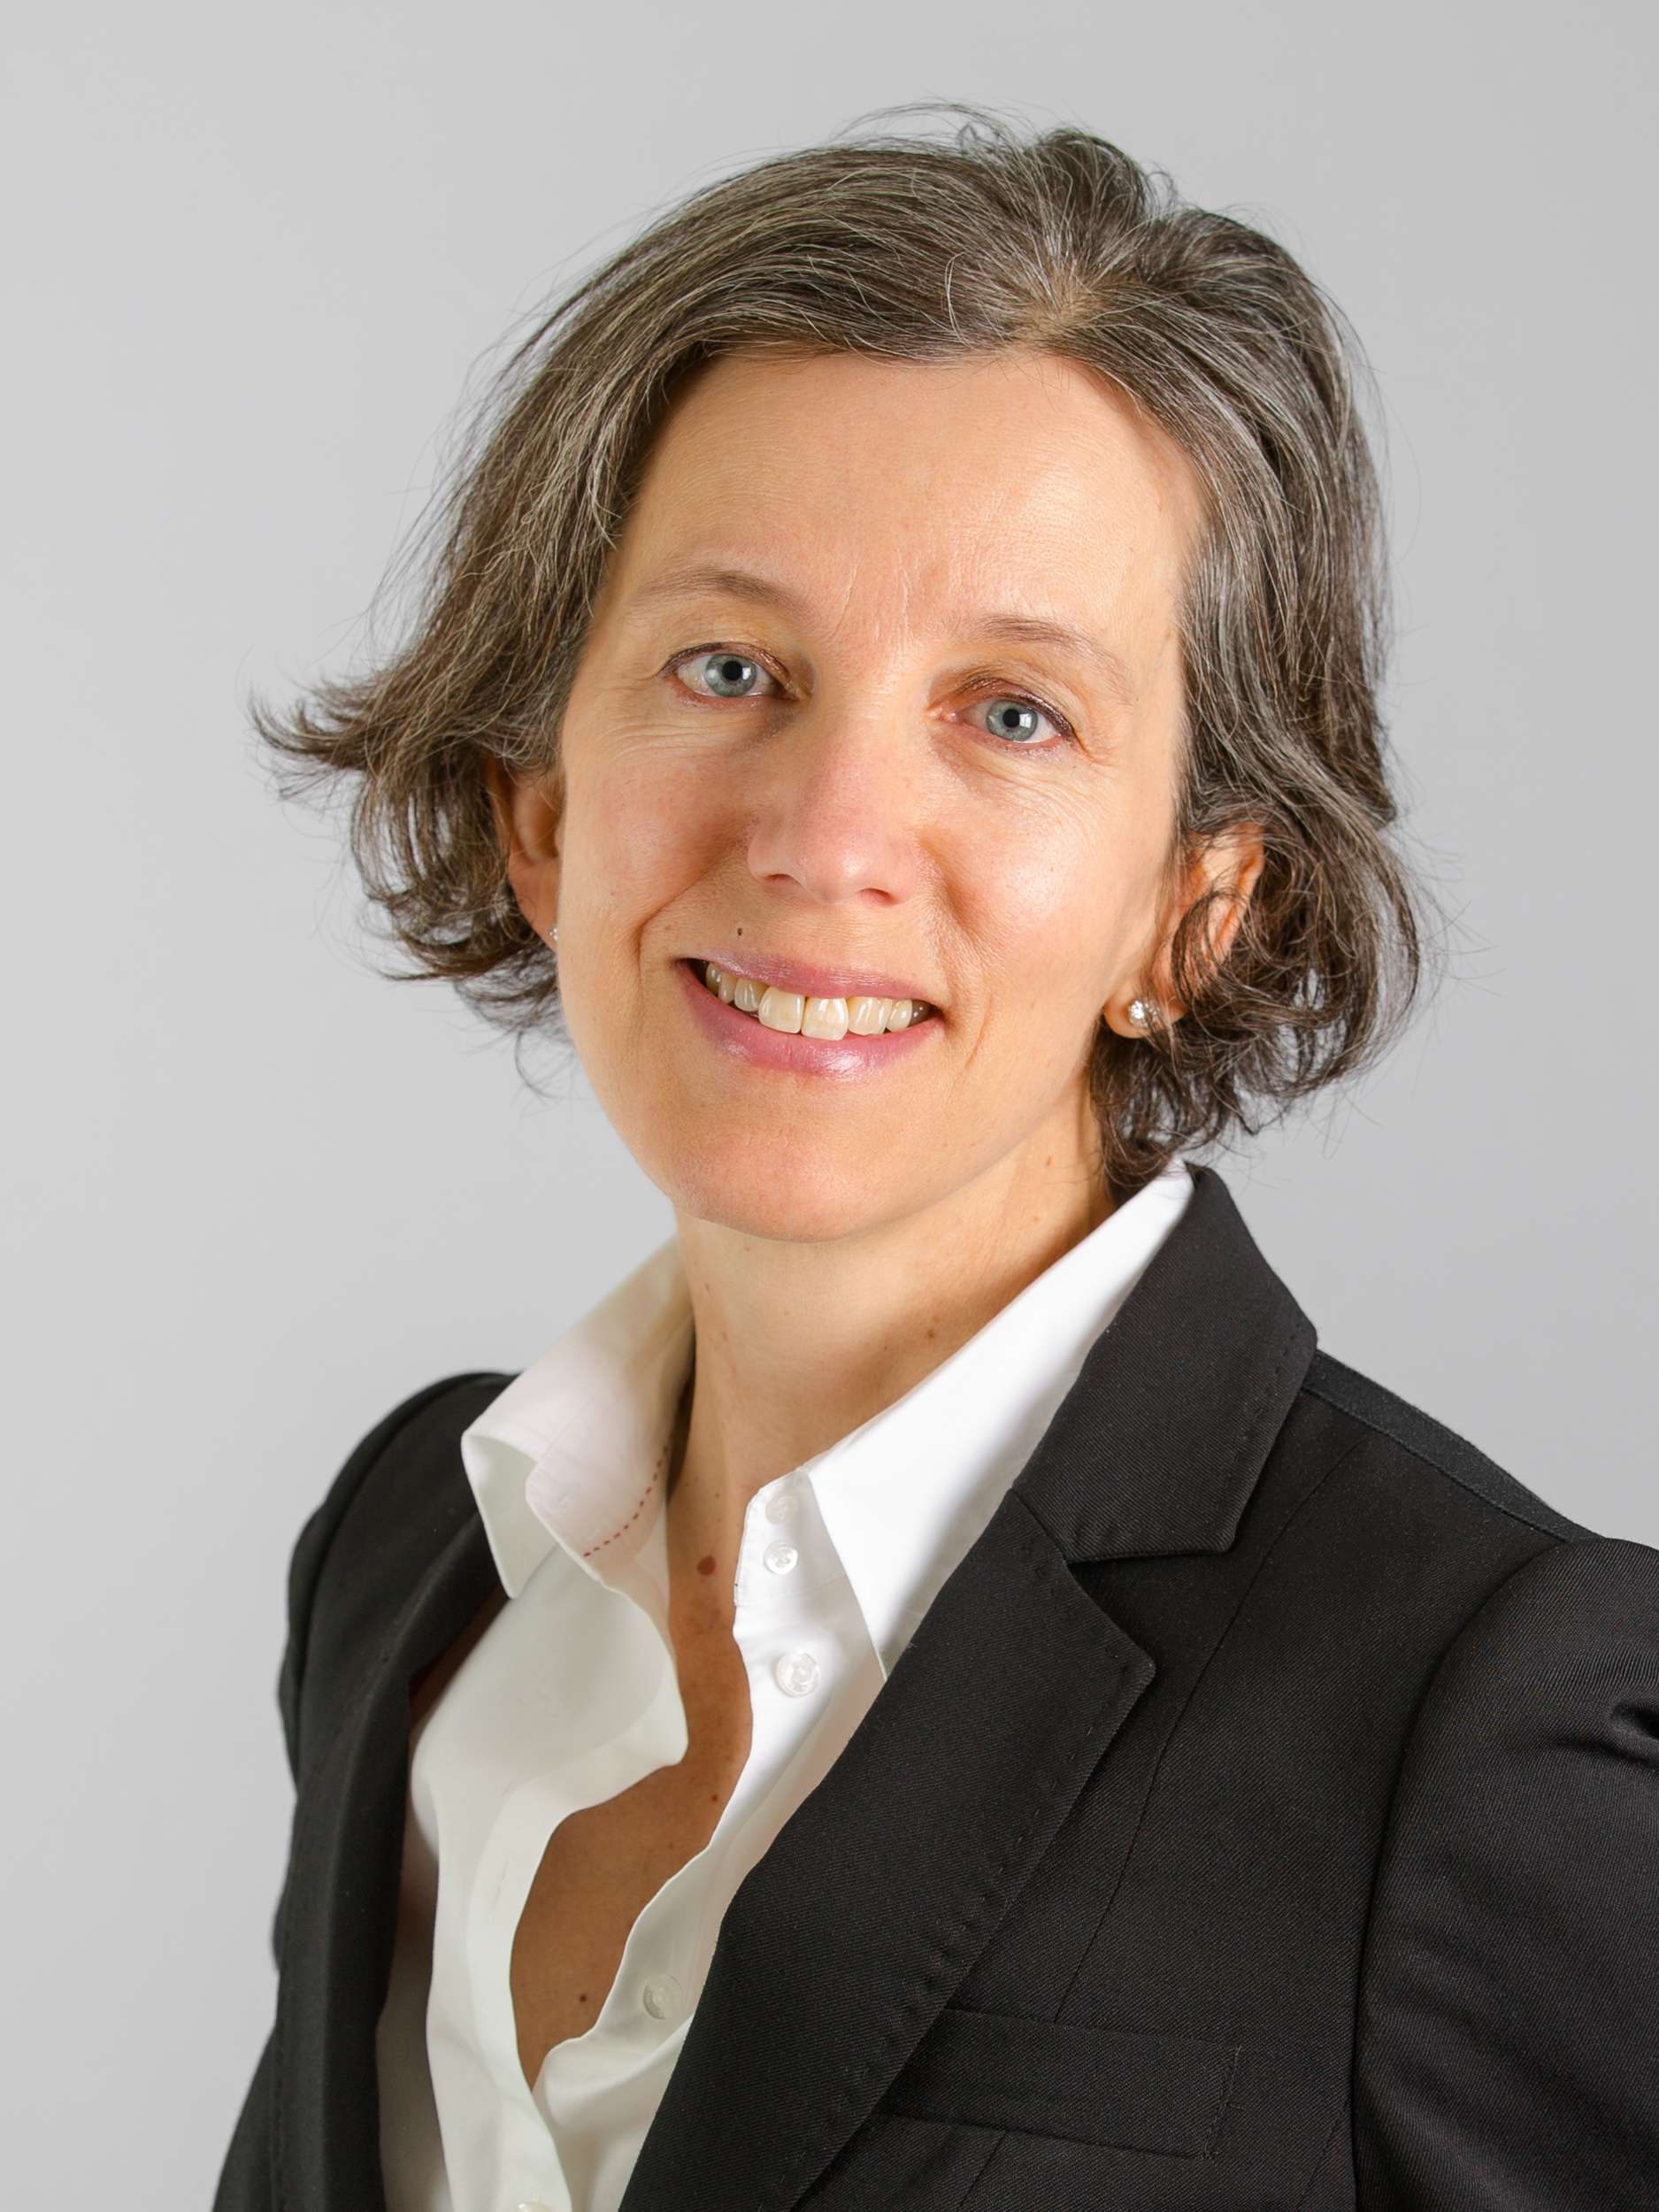 Ms. Julie Scott